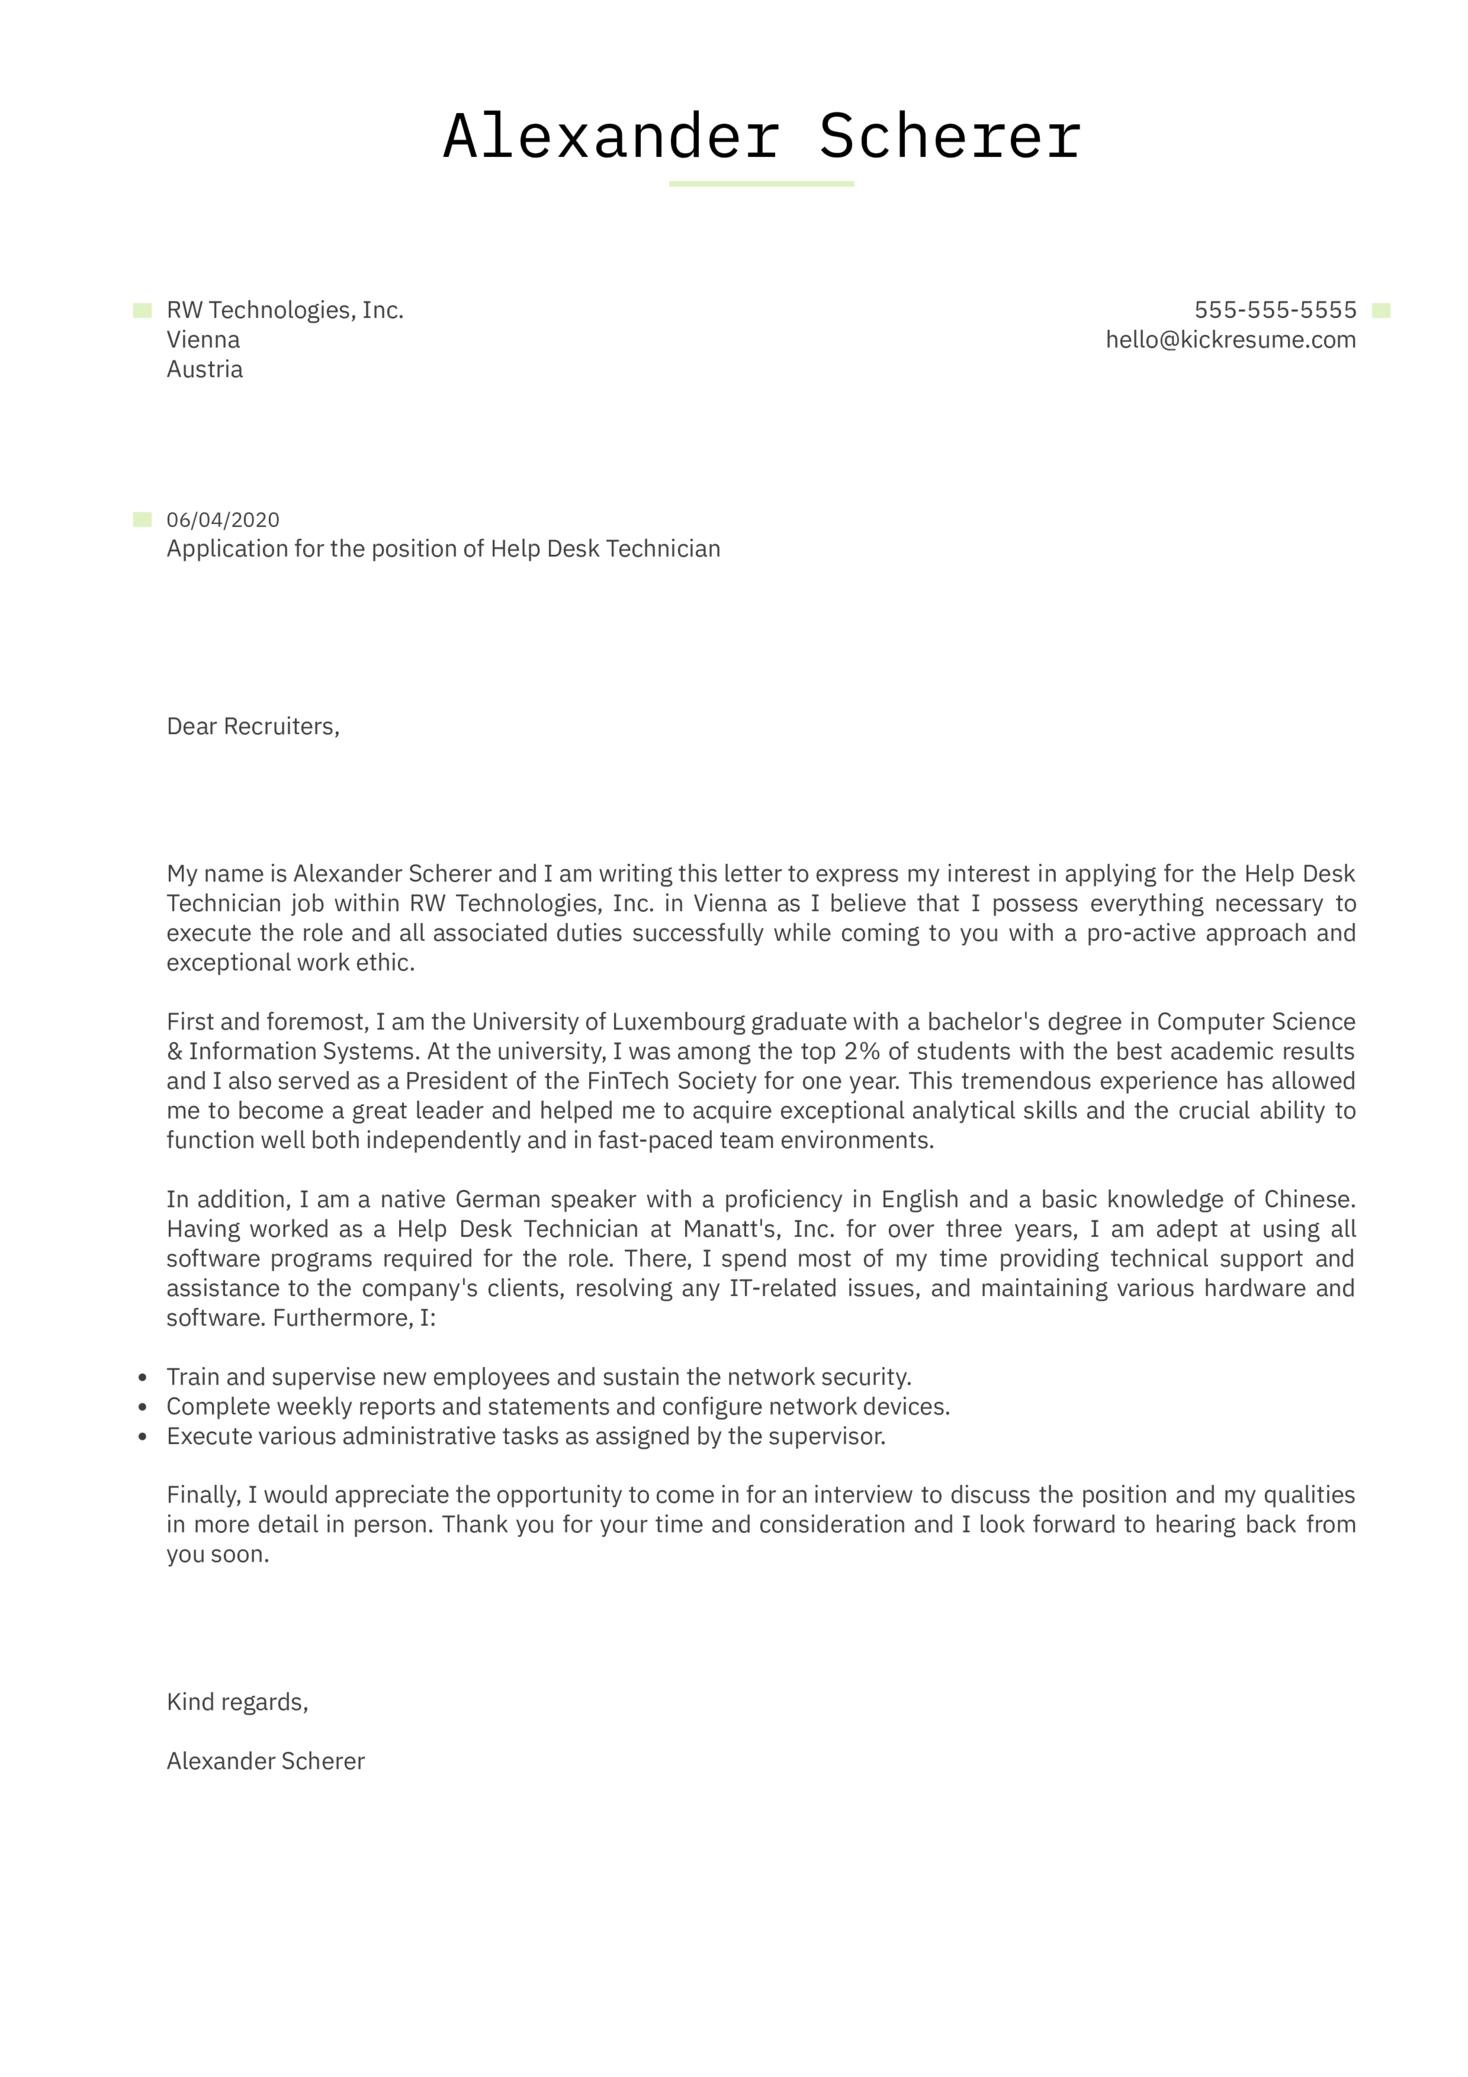 Help Desk Technician Cover Letter Example